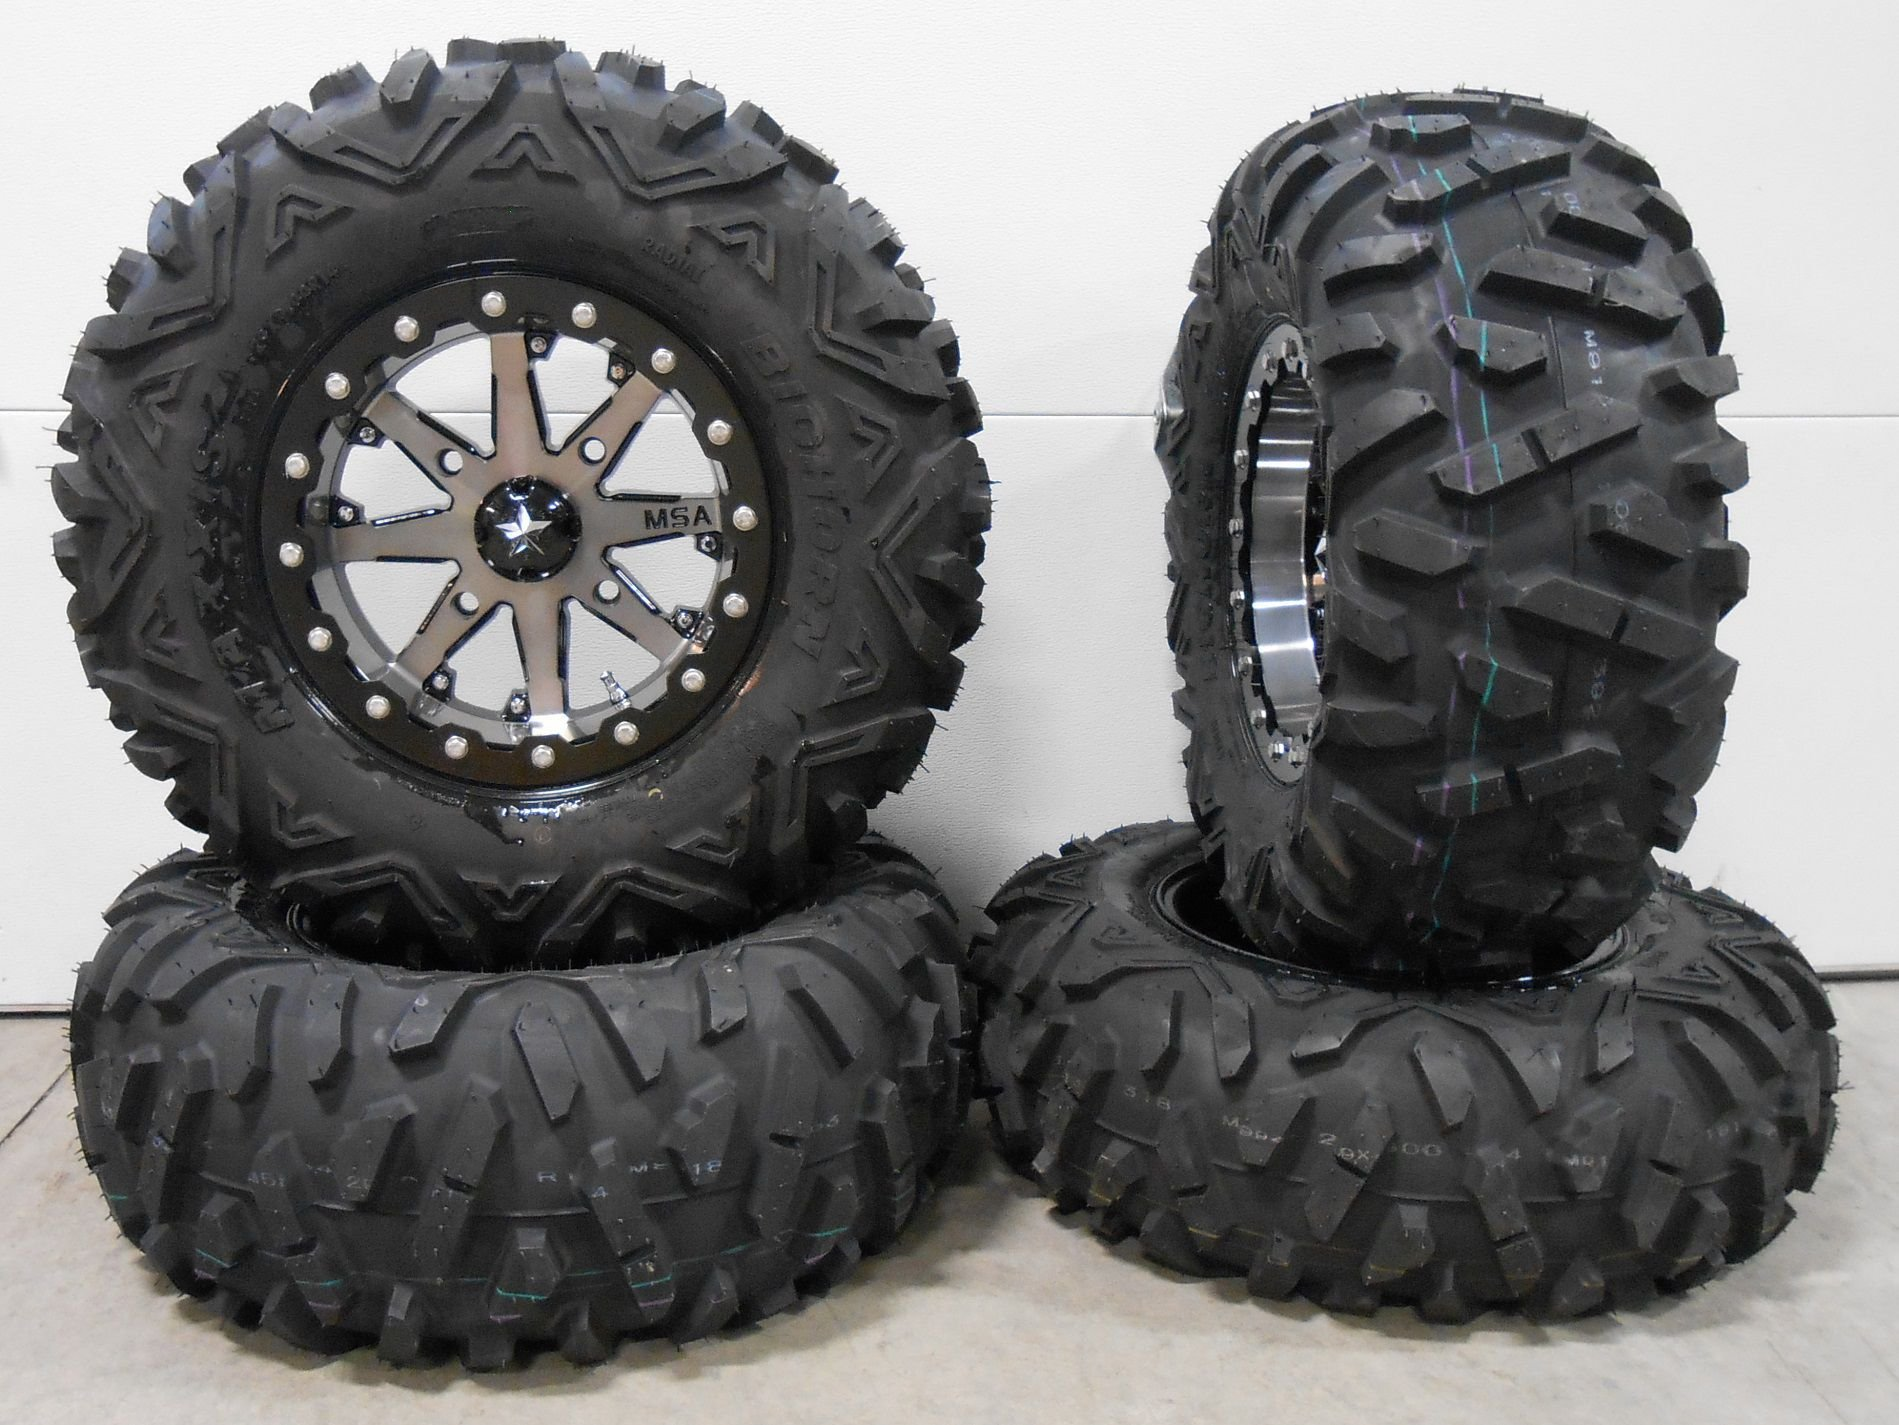 Bundle - 9 Items: MSA Lok 14'' ATV Wheels 29'' BigHorn Tires [4x110 Bolt Pattern 10mmx1.25 Lug Kit]